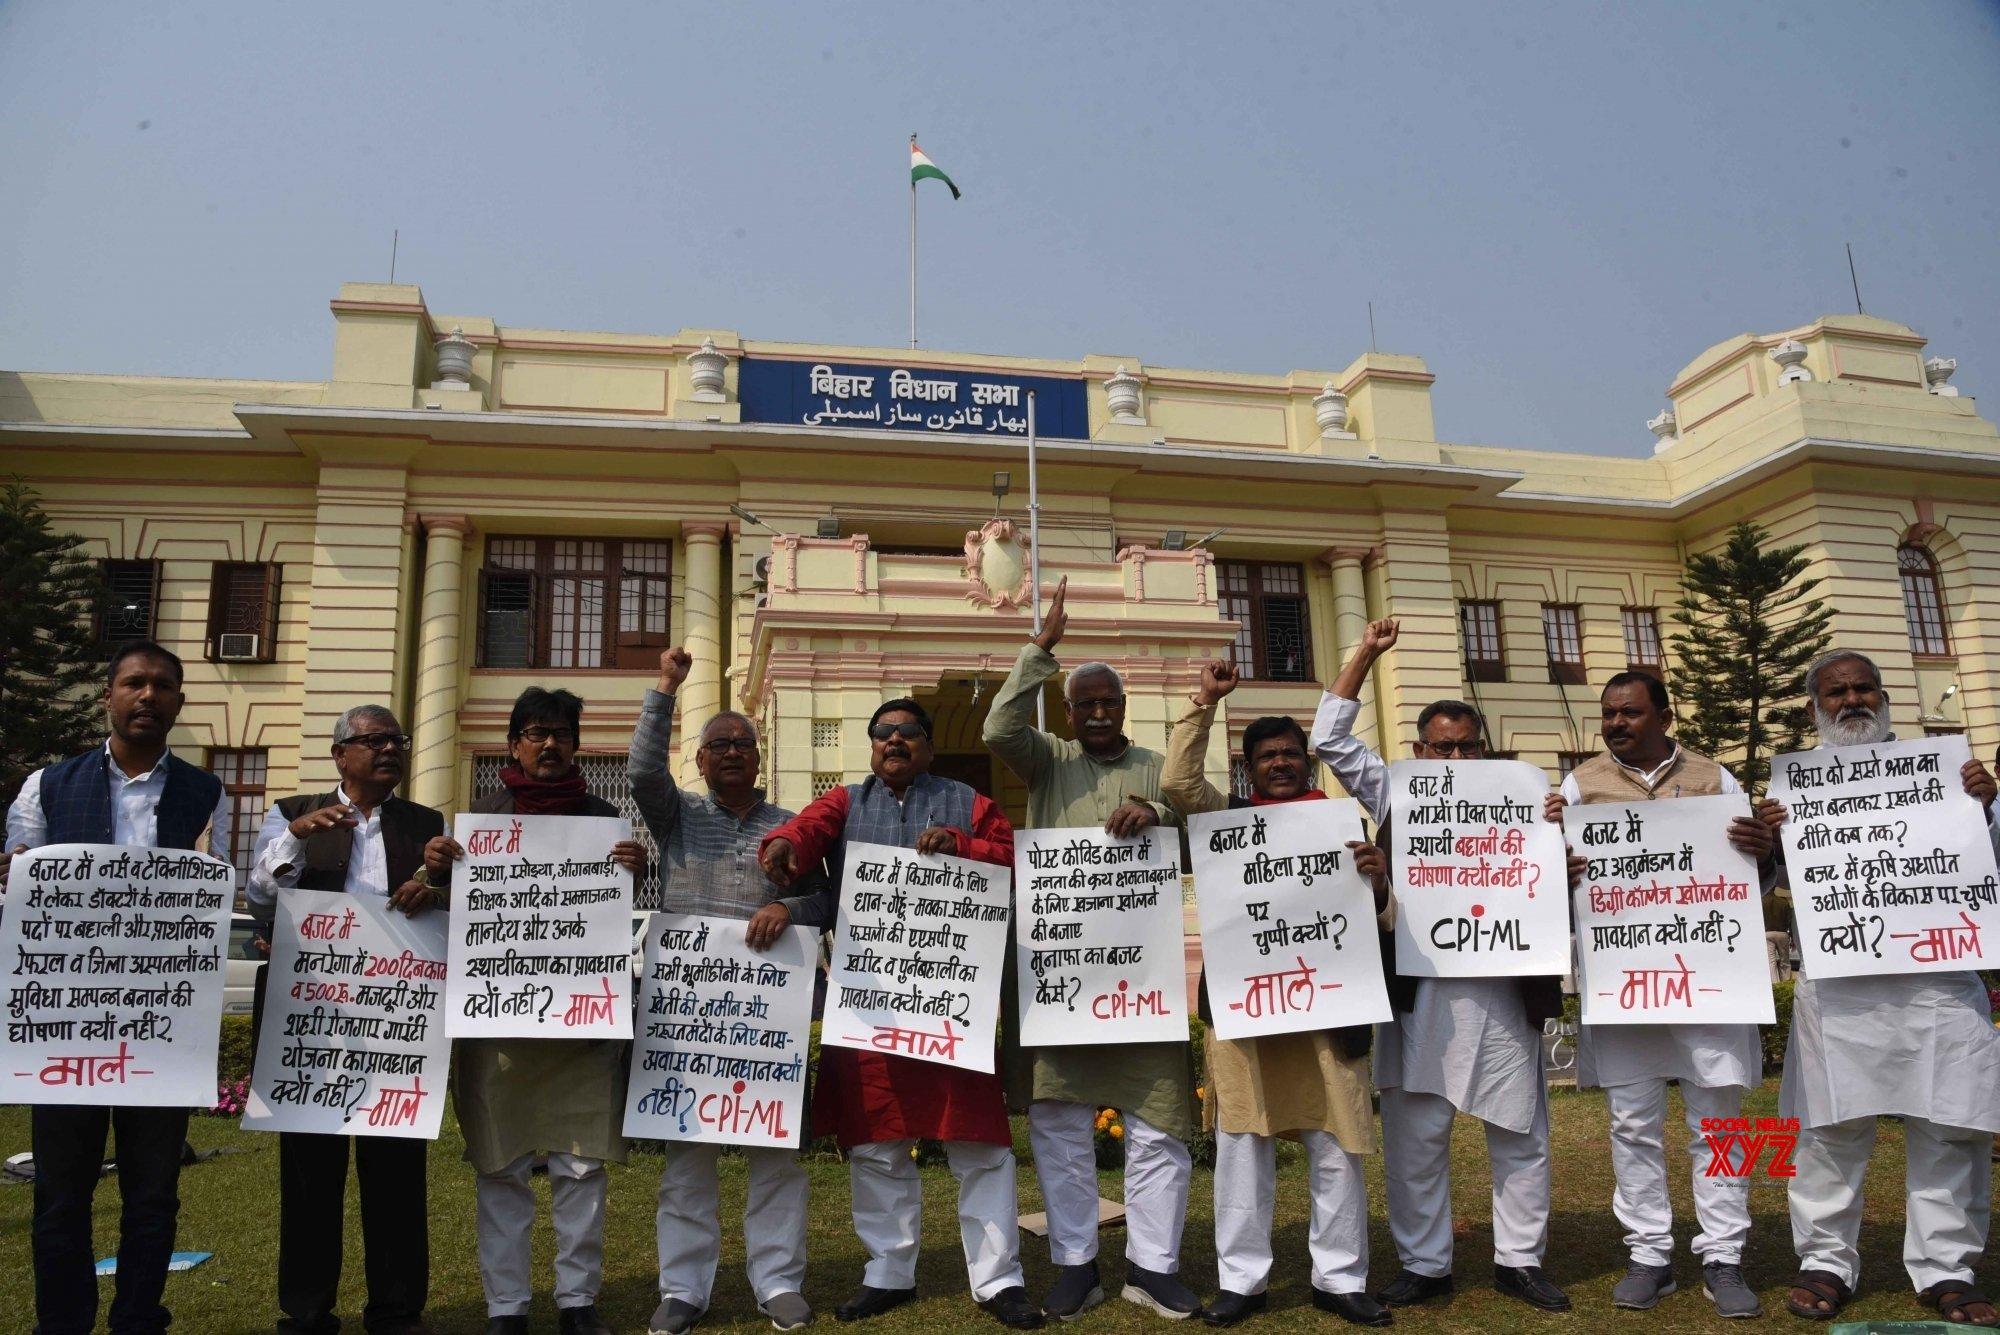 Patna: CPI - ML legislators staged a protest outside Bihar Vidhan Sabha #Gallery